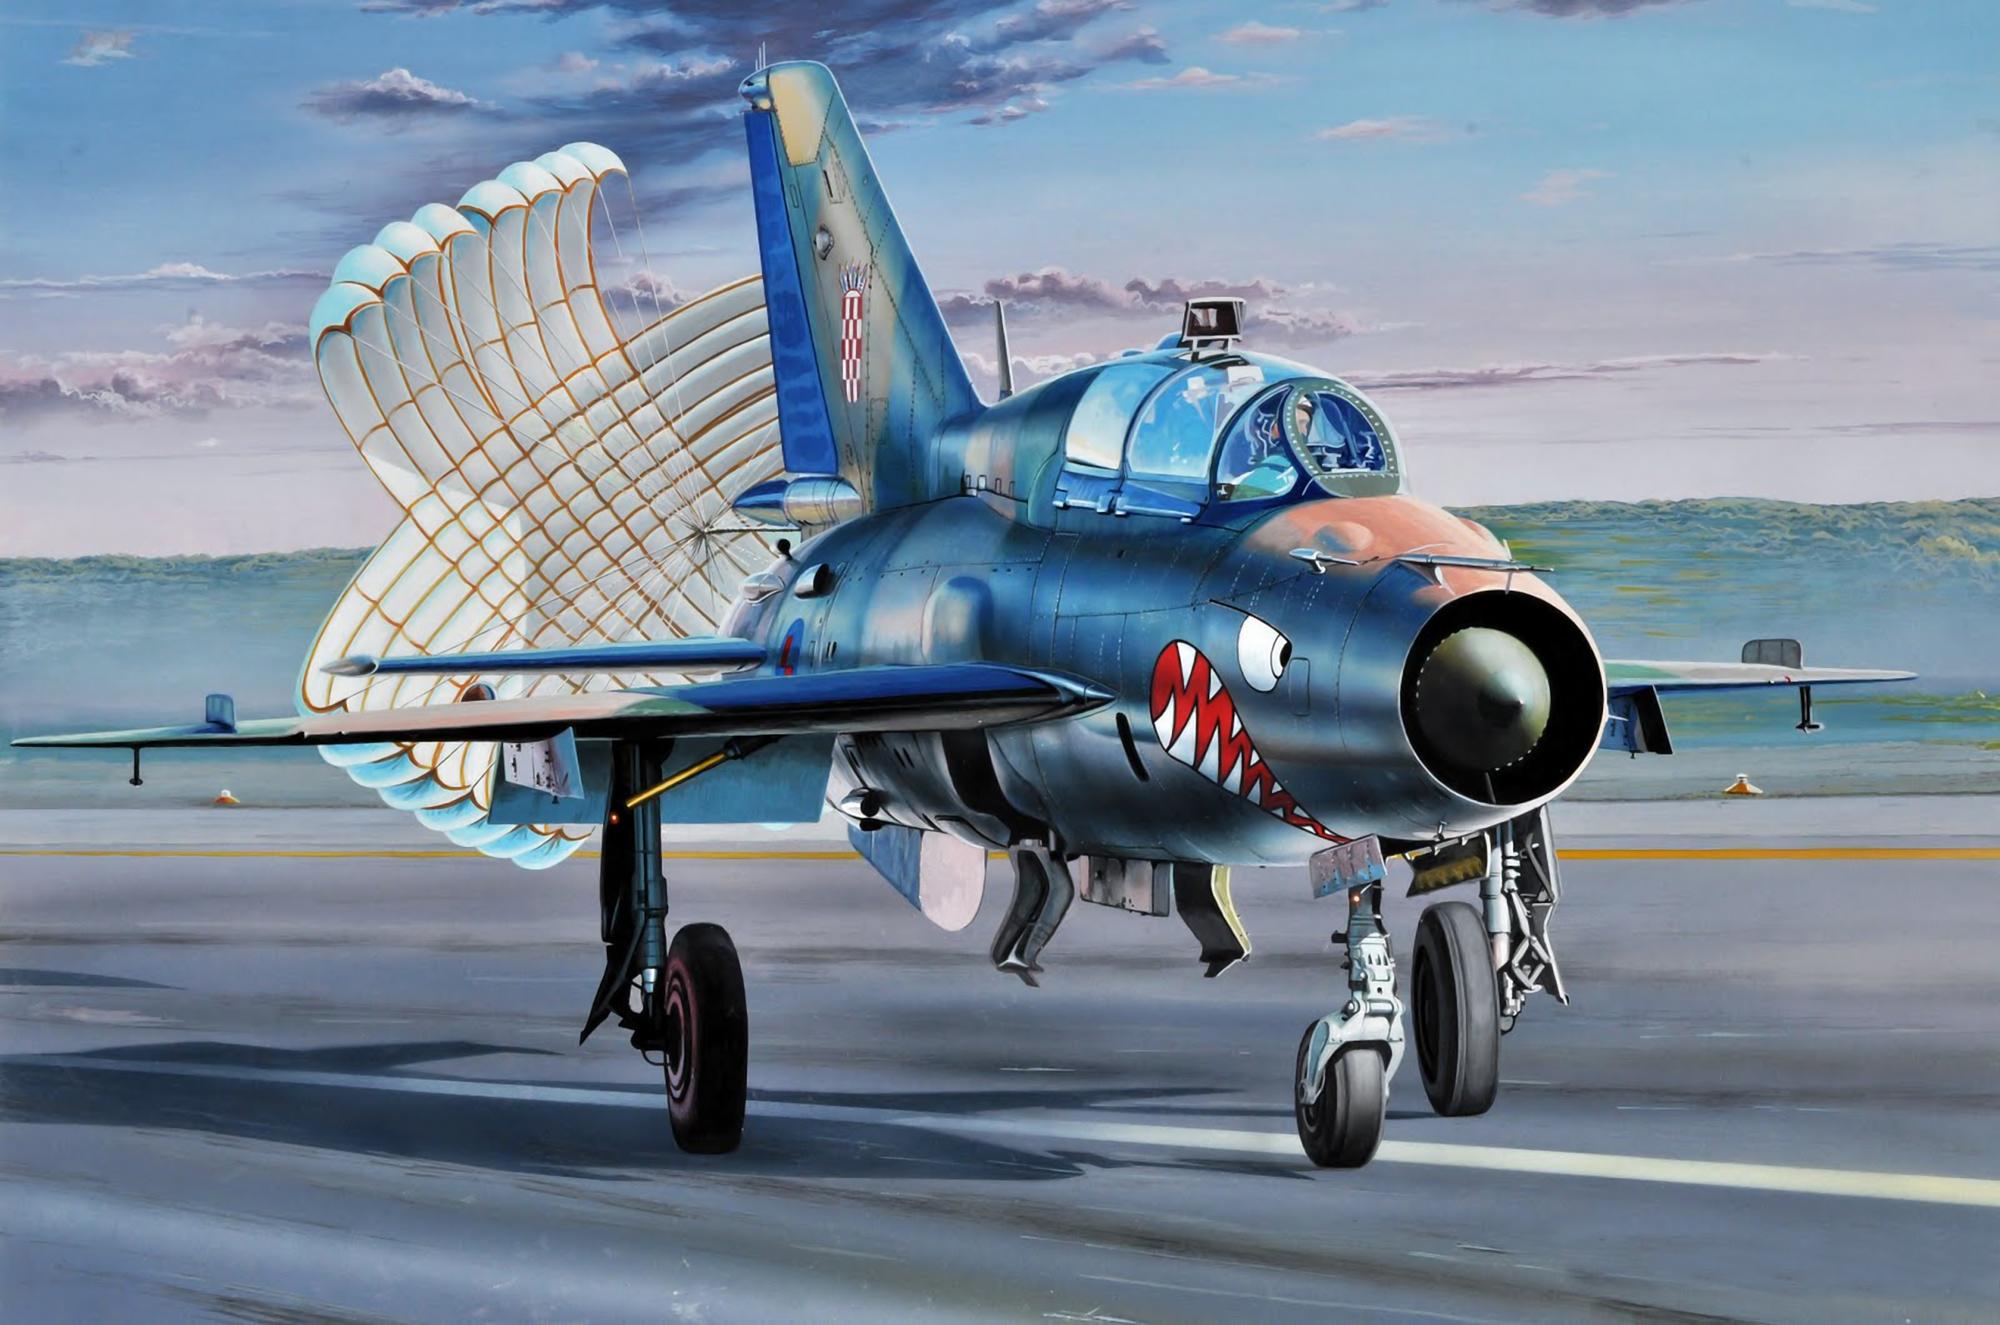 рисунок МиГ-21 ВВС Хорватии